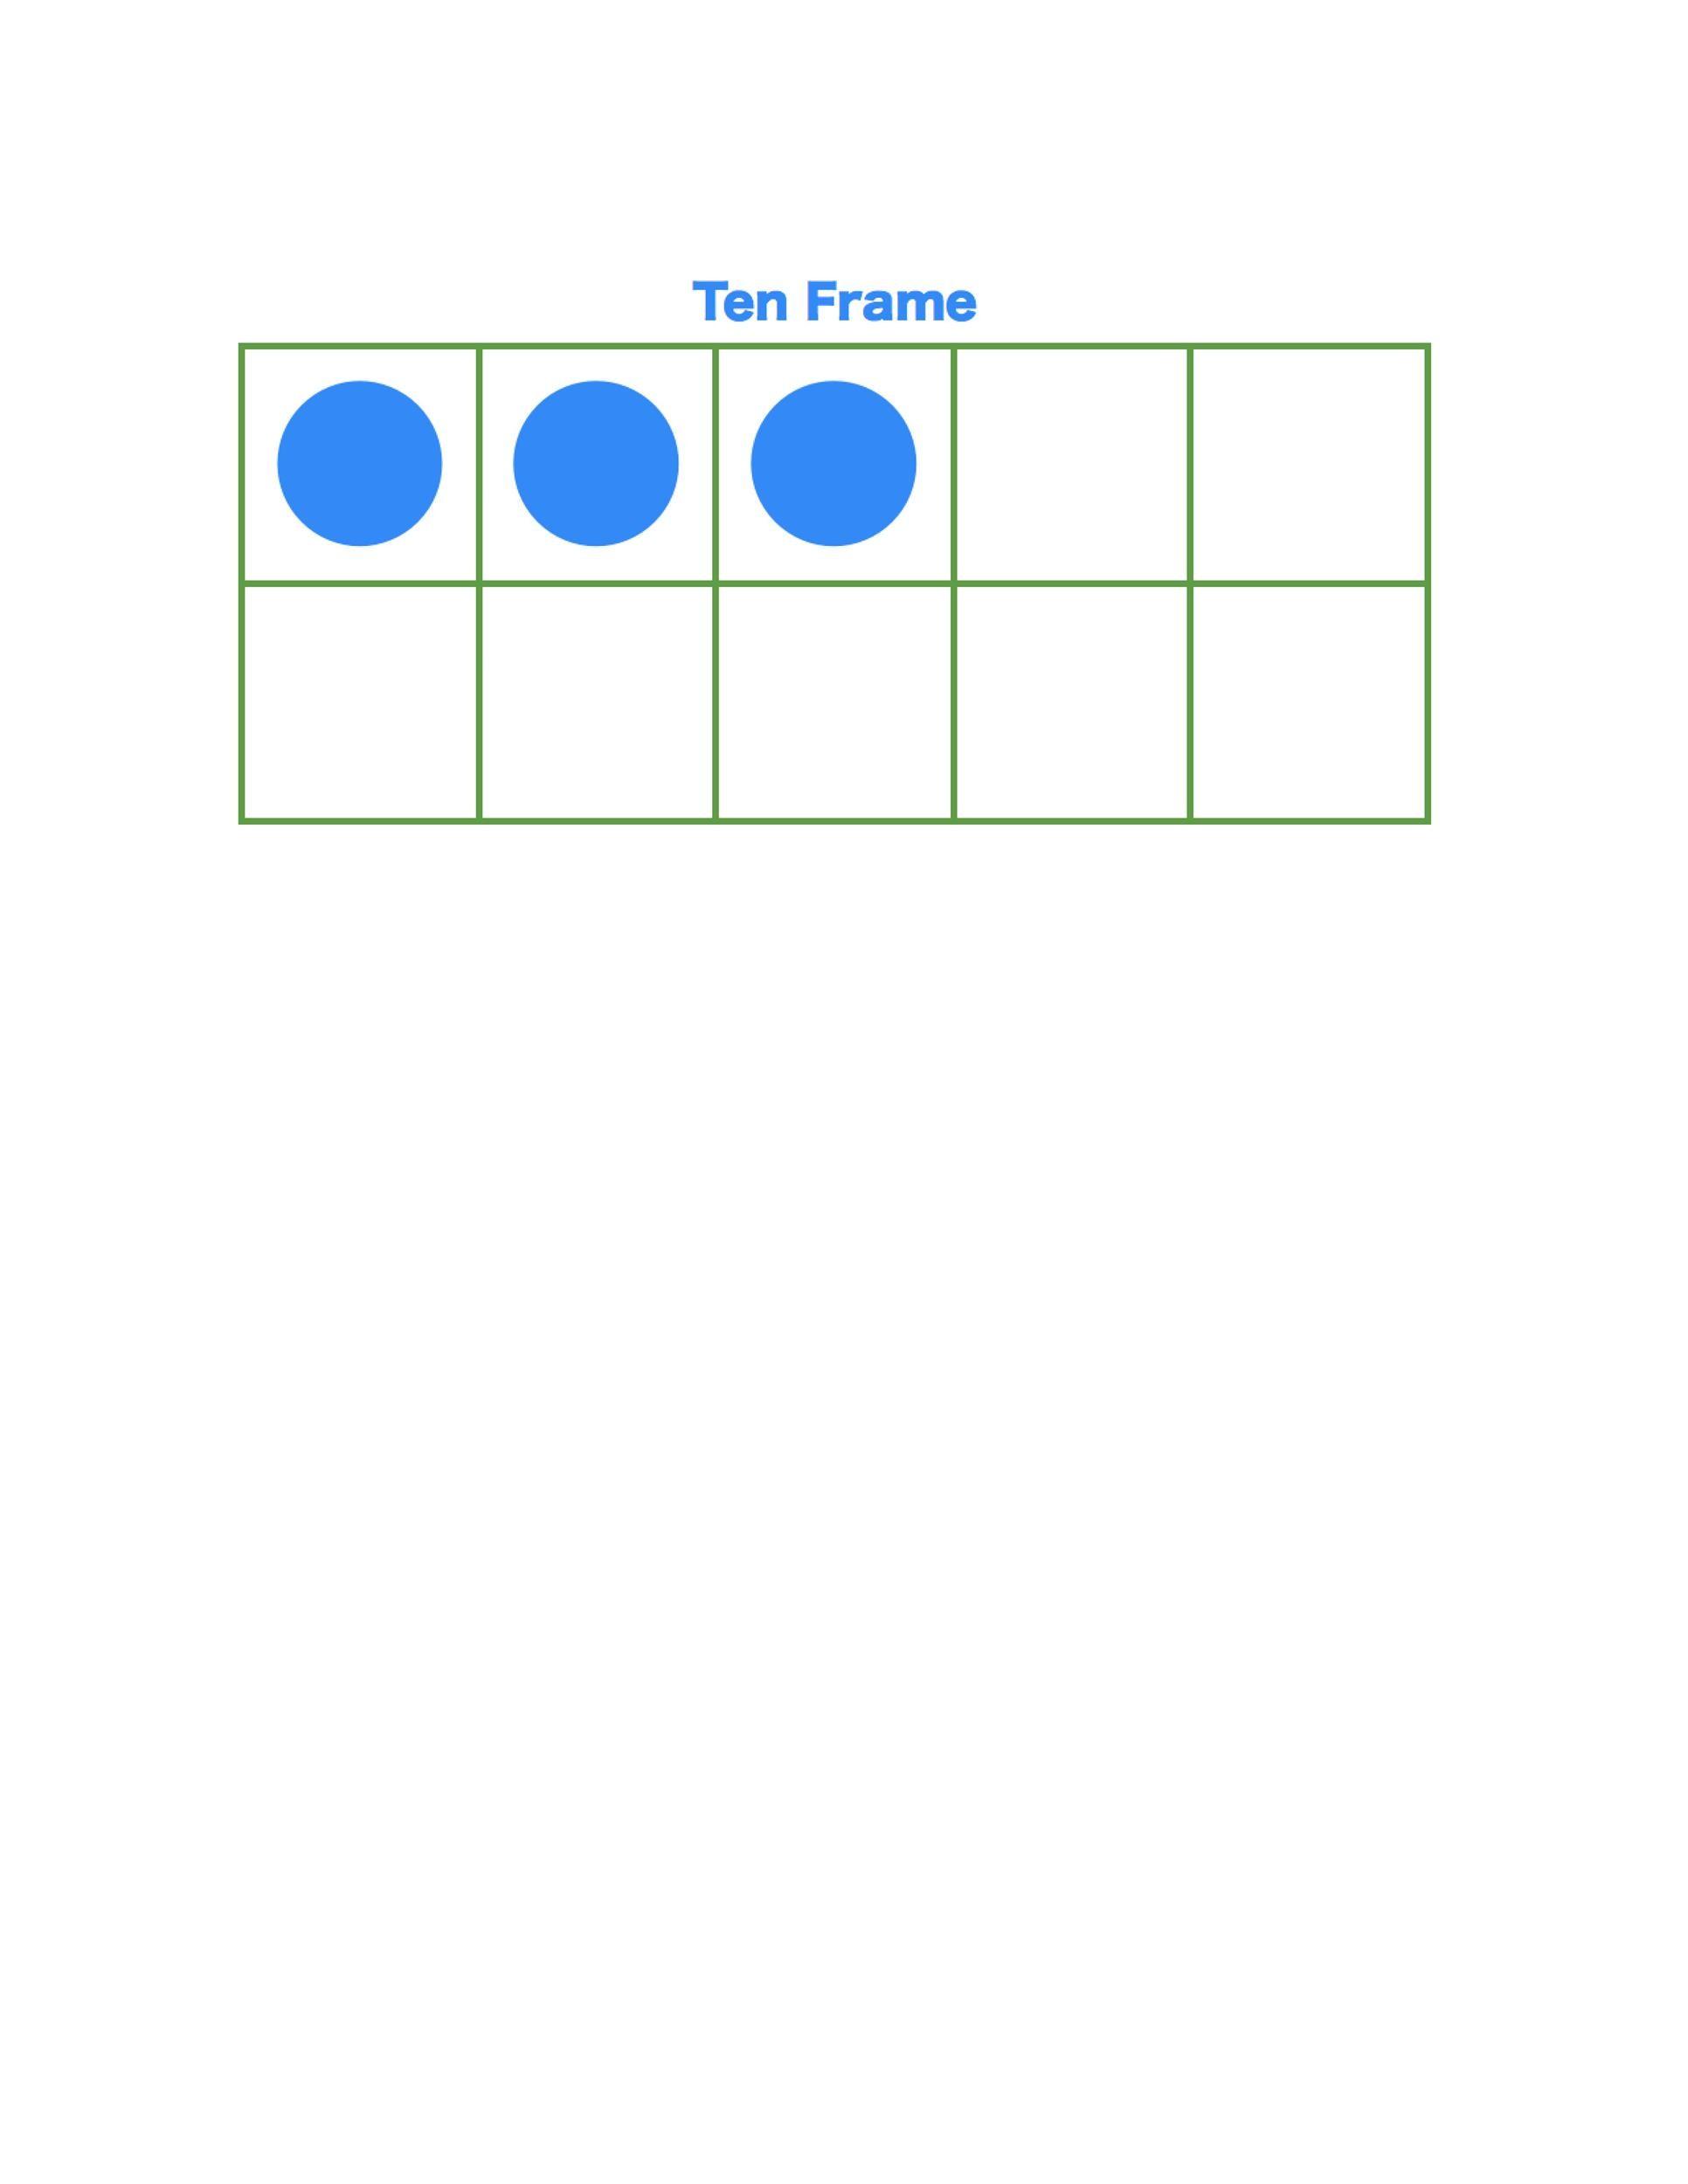 Free Ten Frame Template 27